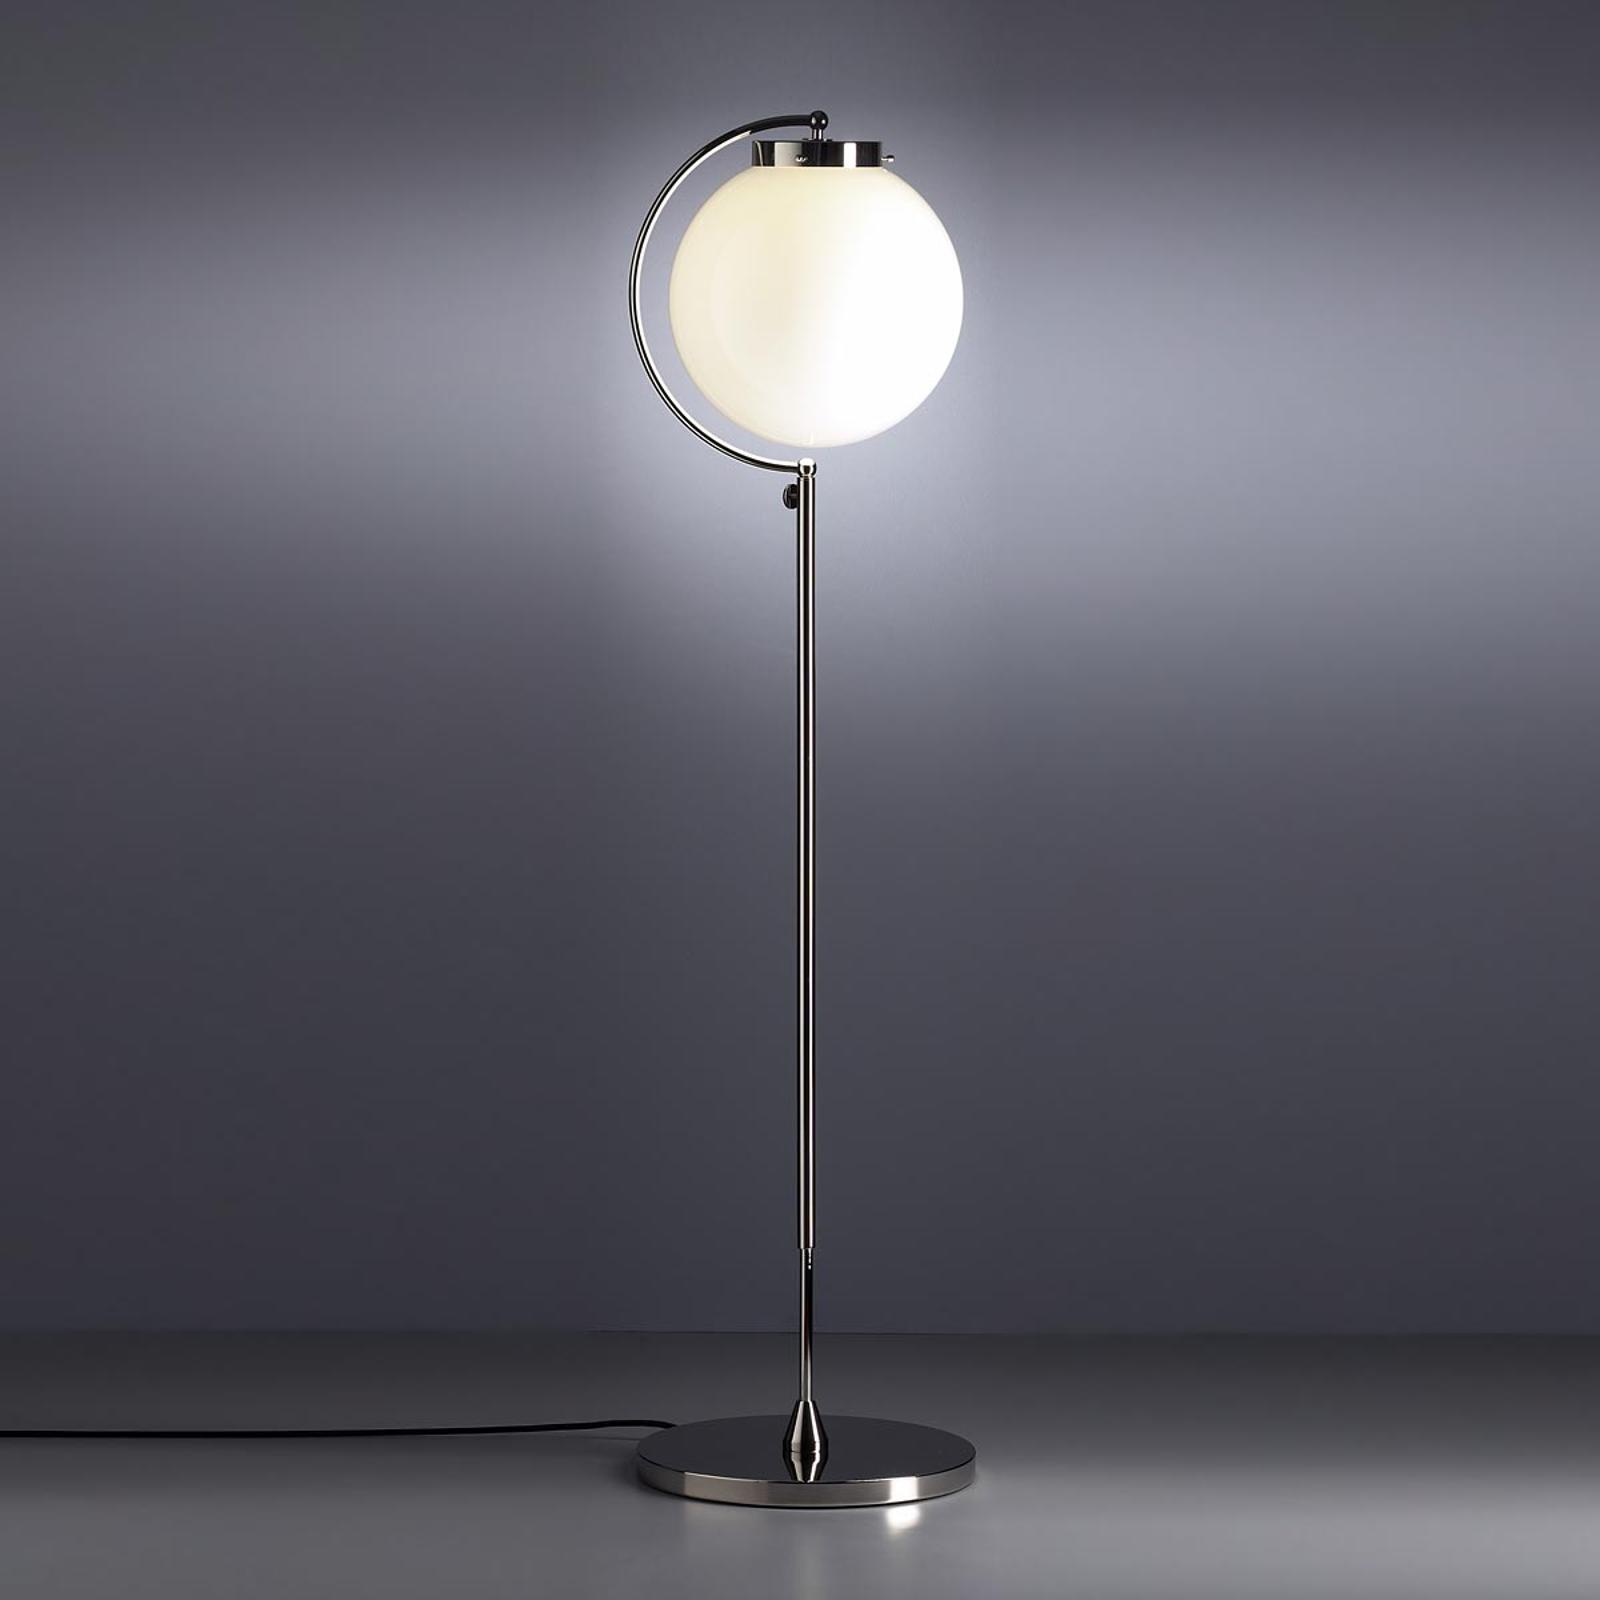 Lampa stojąca Richarda Döckera w stylu Bauhaus